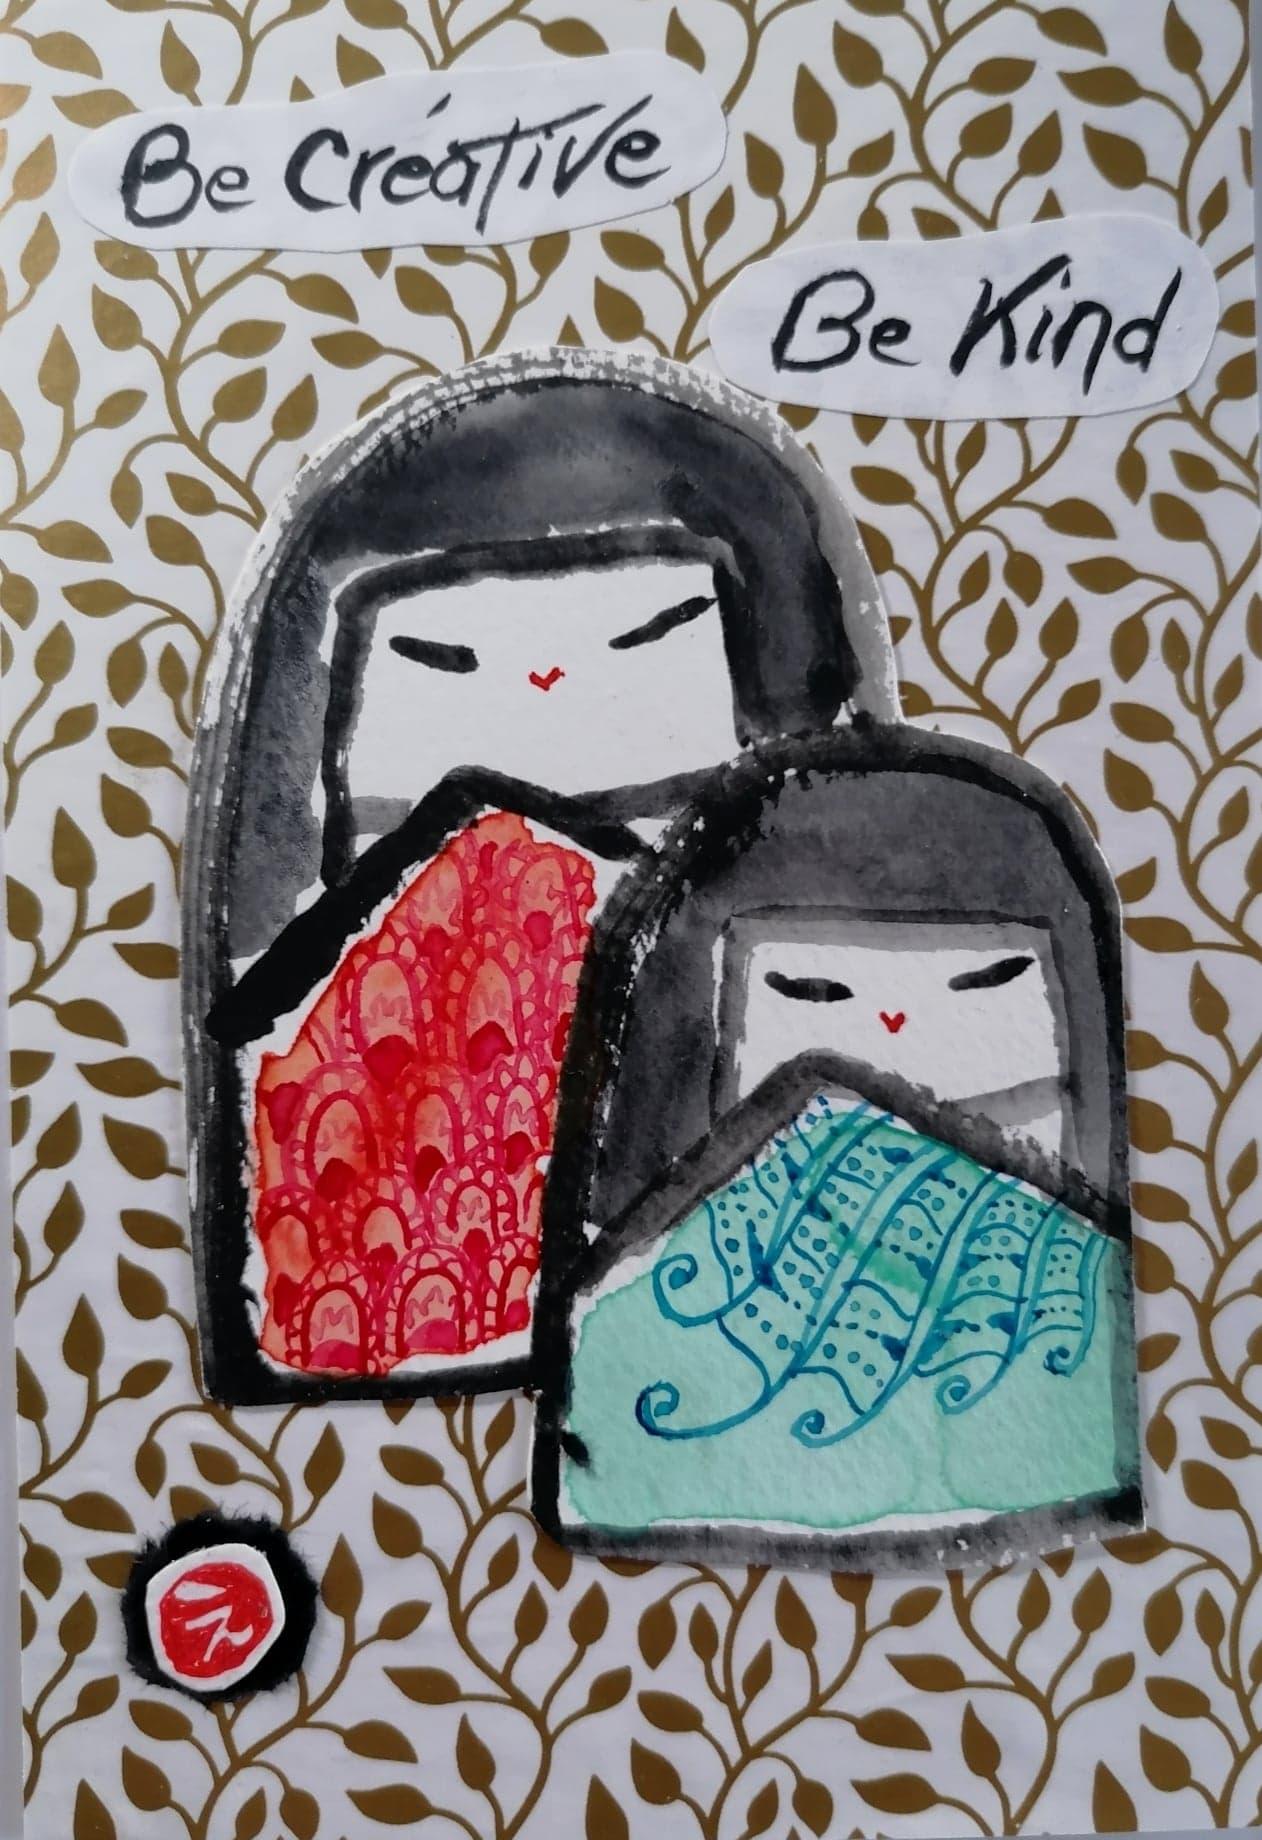 Be creative, be kind